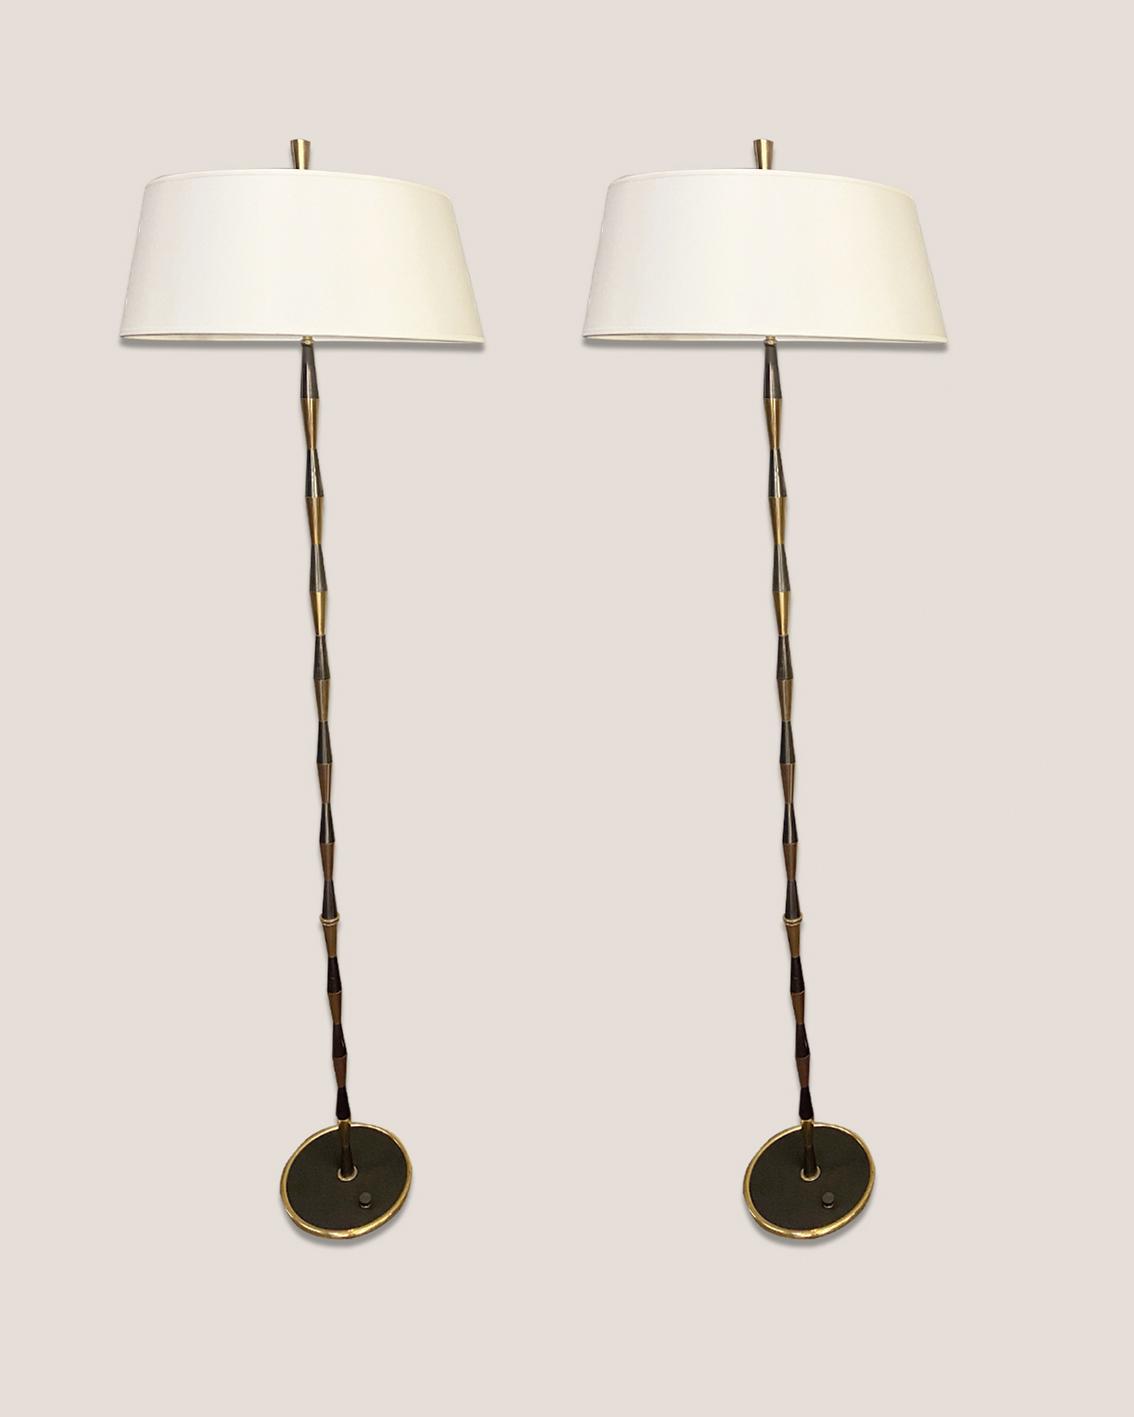 Lampes danoises 3